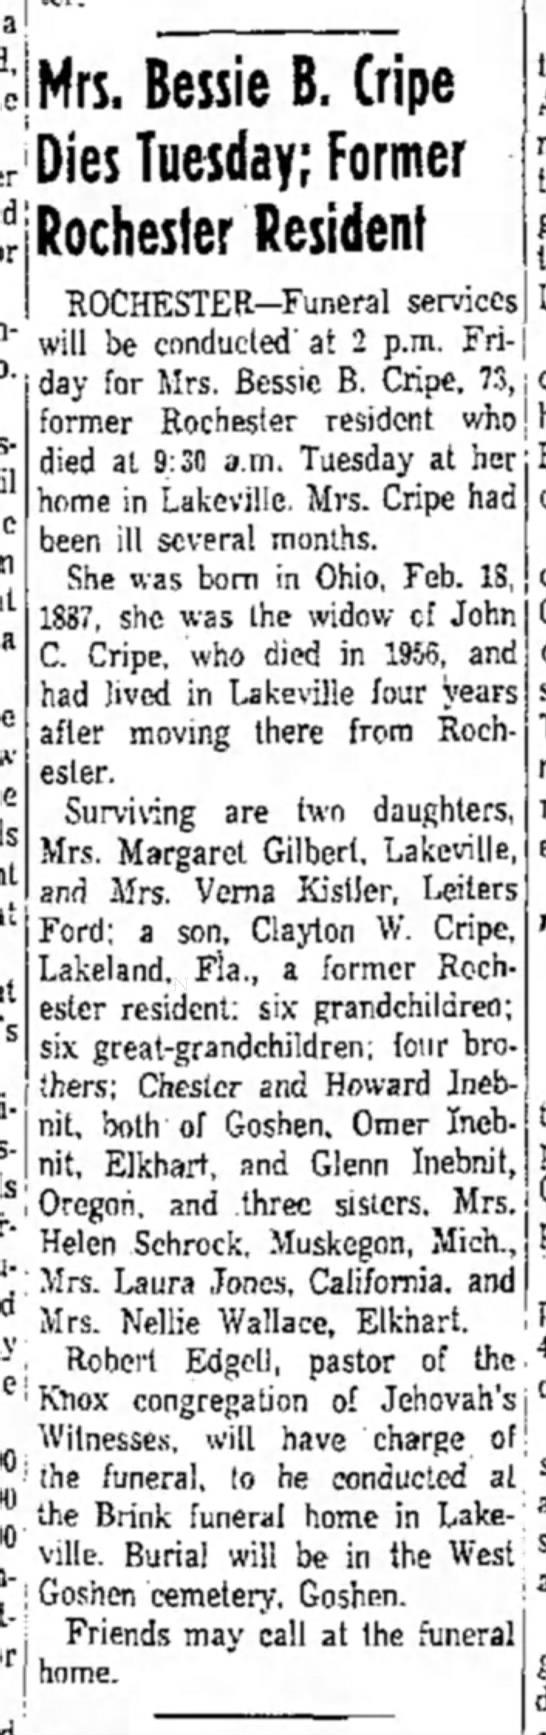 Bessie B. (Inebnit) Cripe dies Tues. The Logansport Press (Logansport, Indiana) 25 Aug 1960 p.23 -